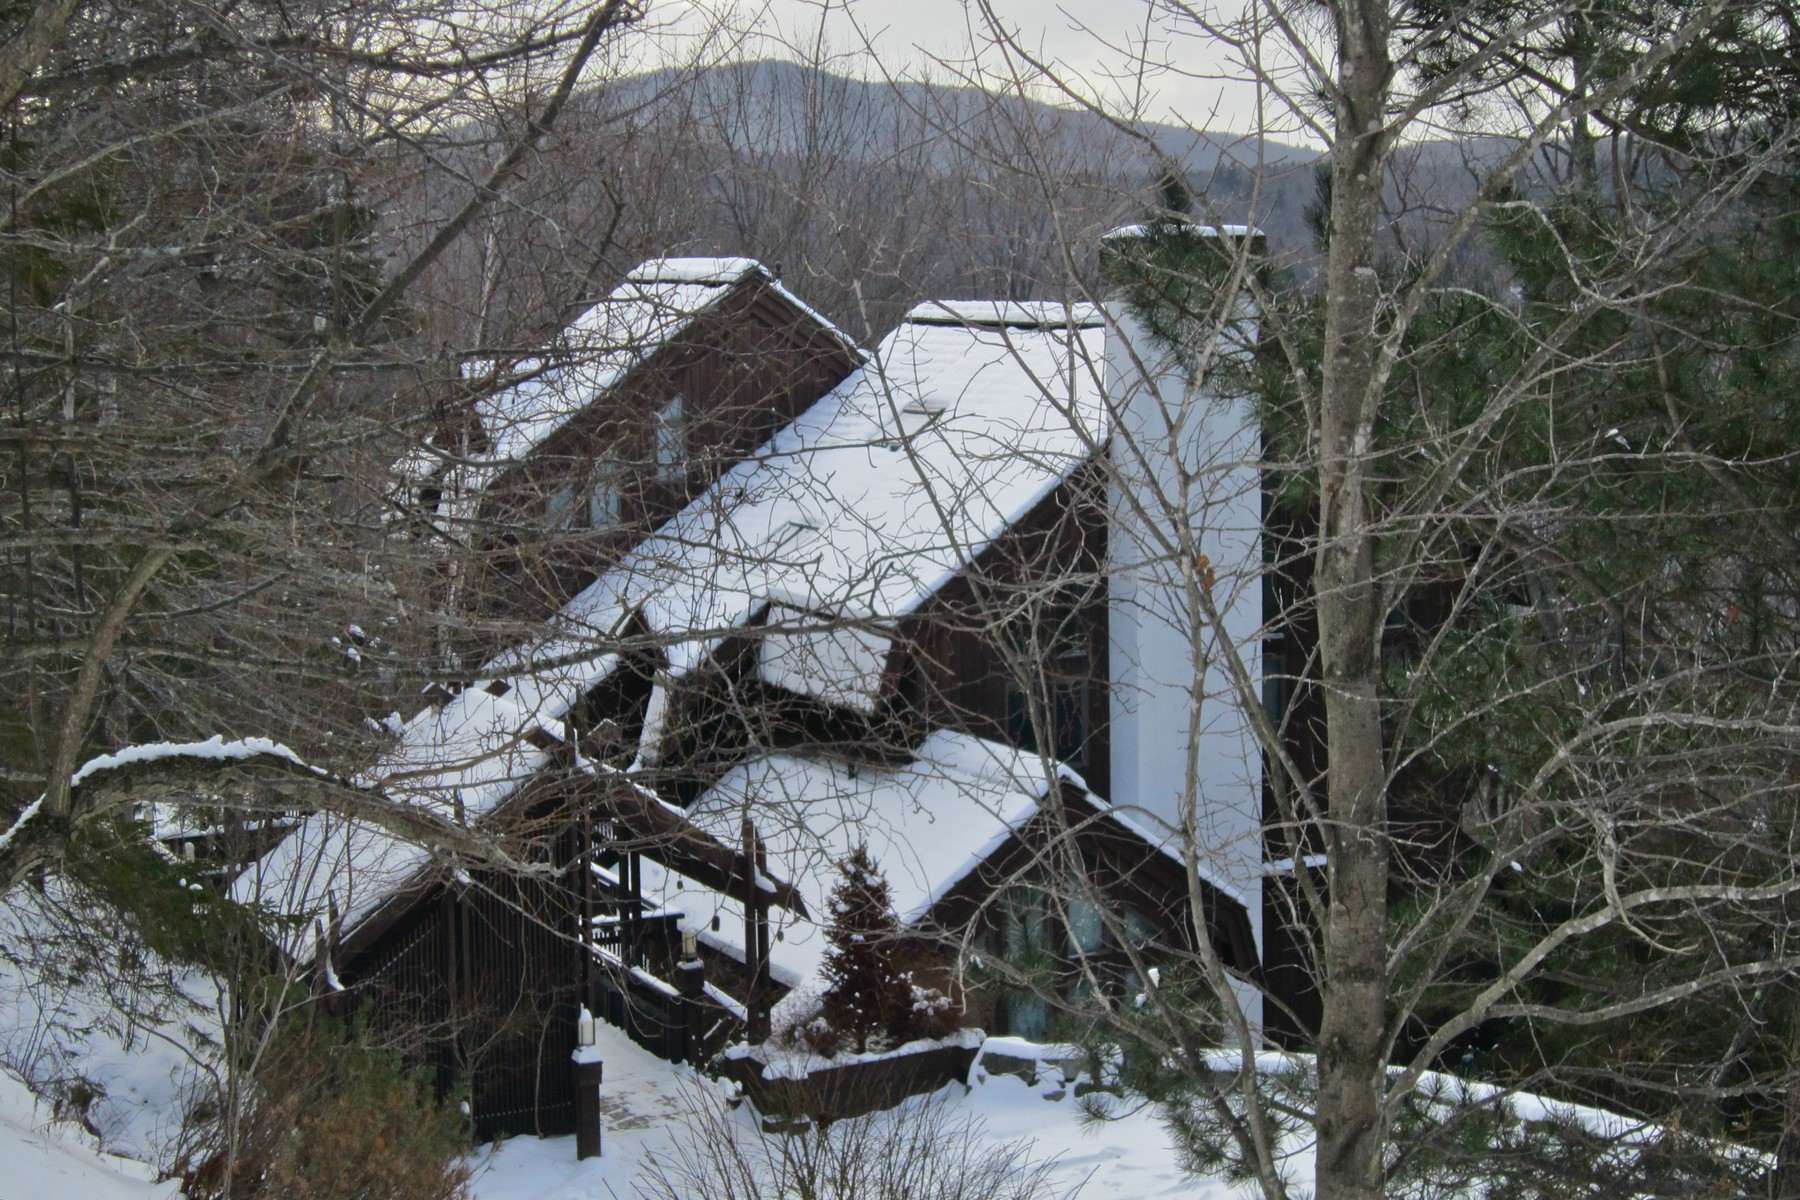 Casa Unifamiliar por un Venta en Expansive Custom Home 726 East Ash Rd Plymouth, Vermont, 05056 Estados Unidos